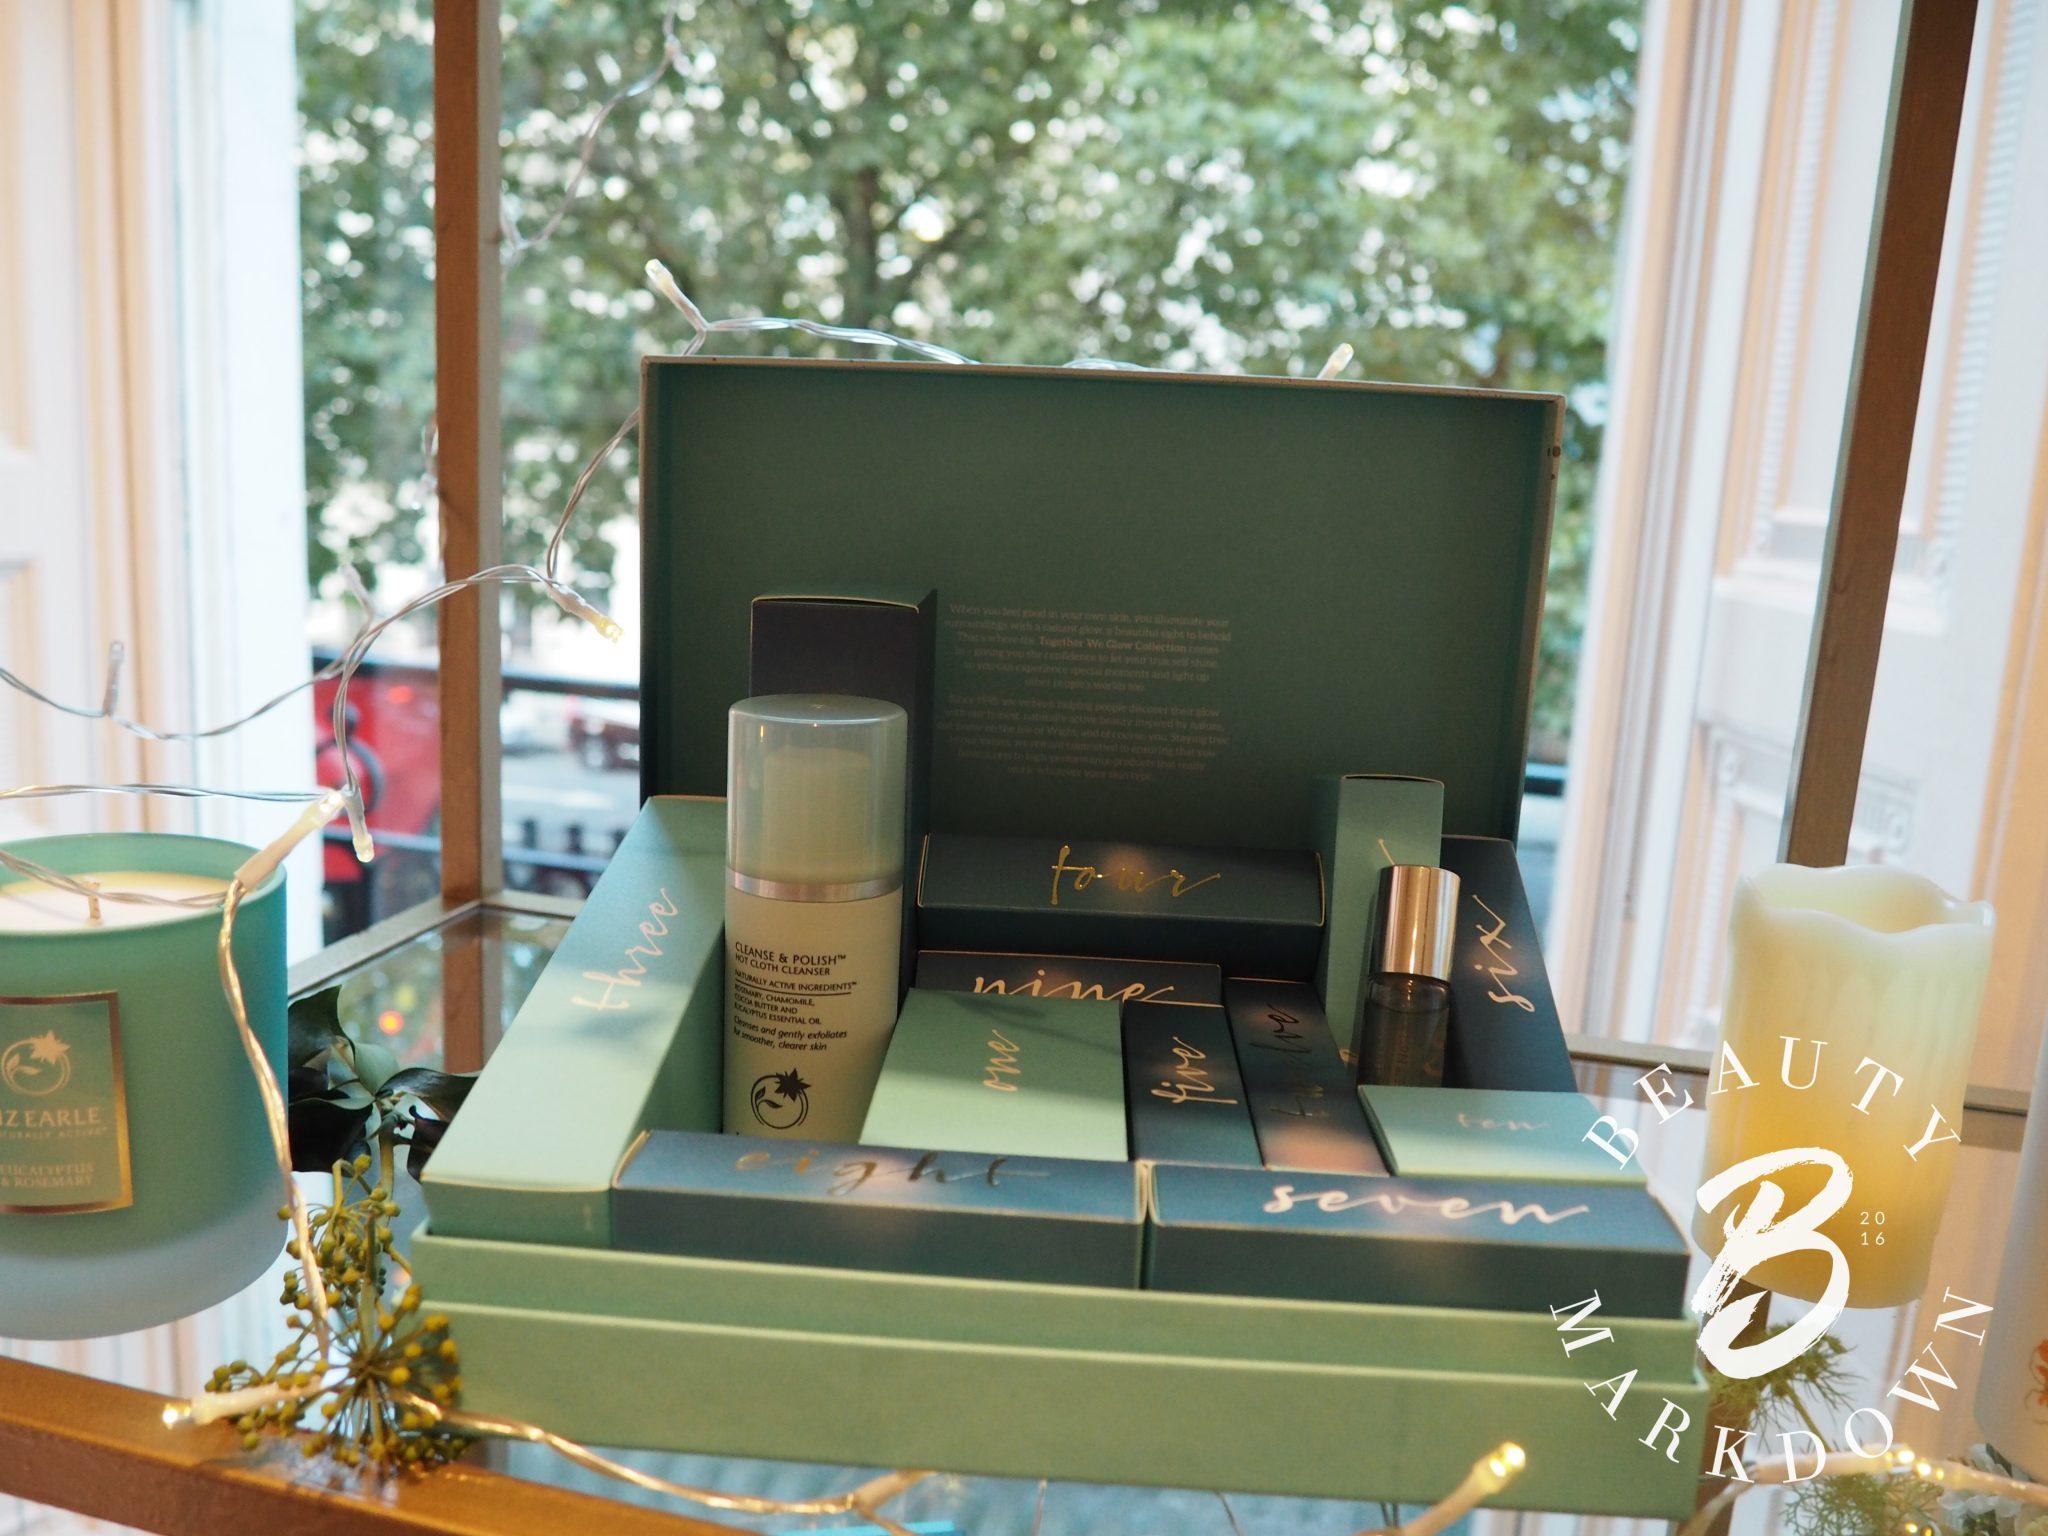 Liz Earle Advent calendar 2017 beauty skincare